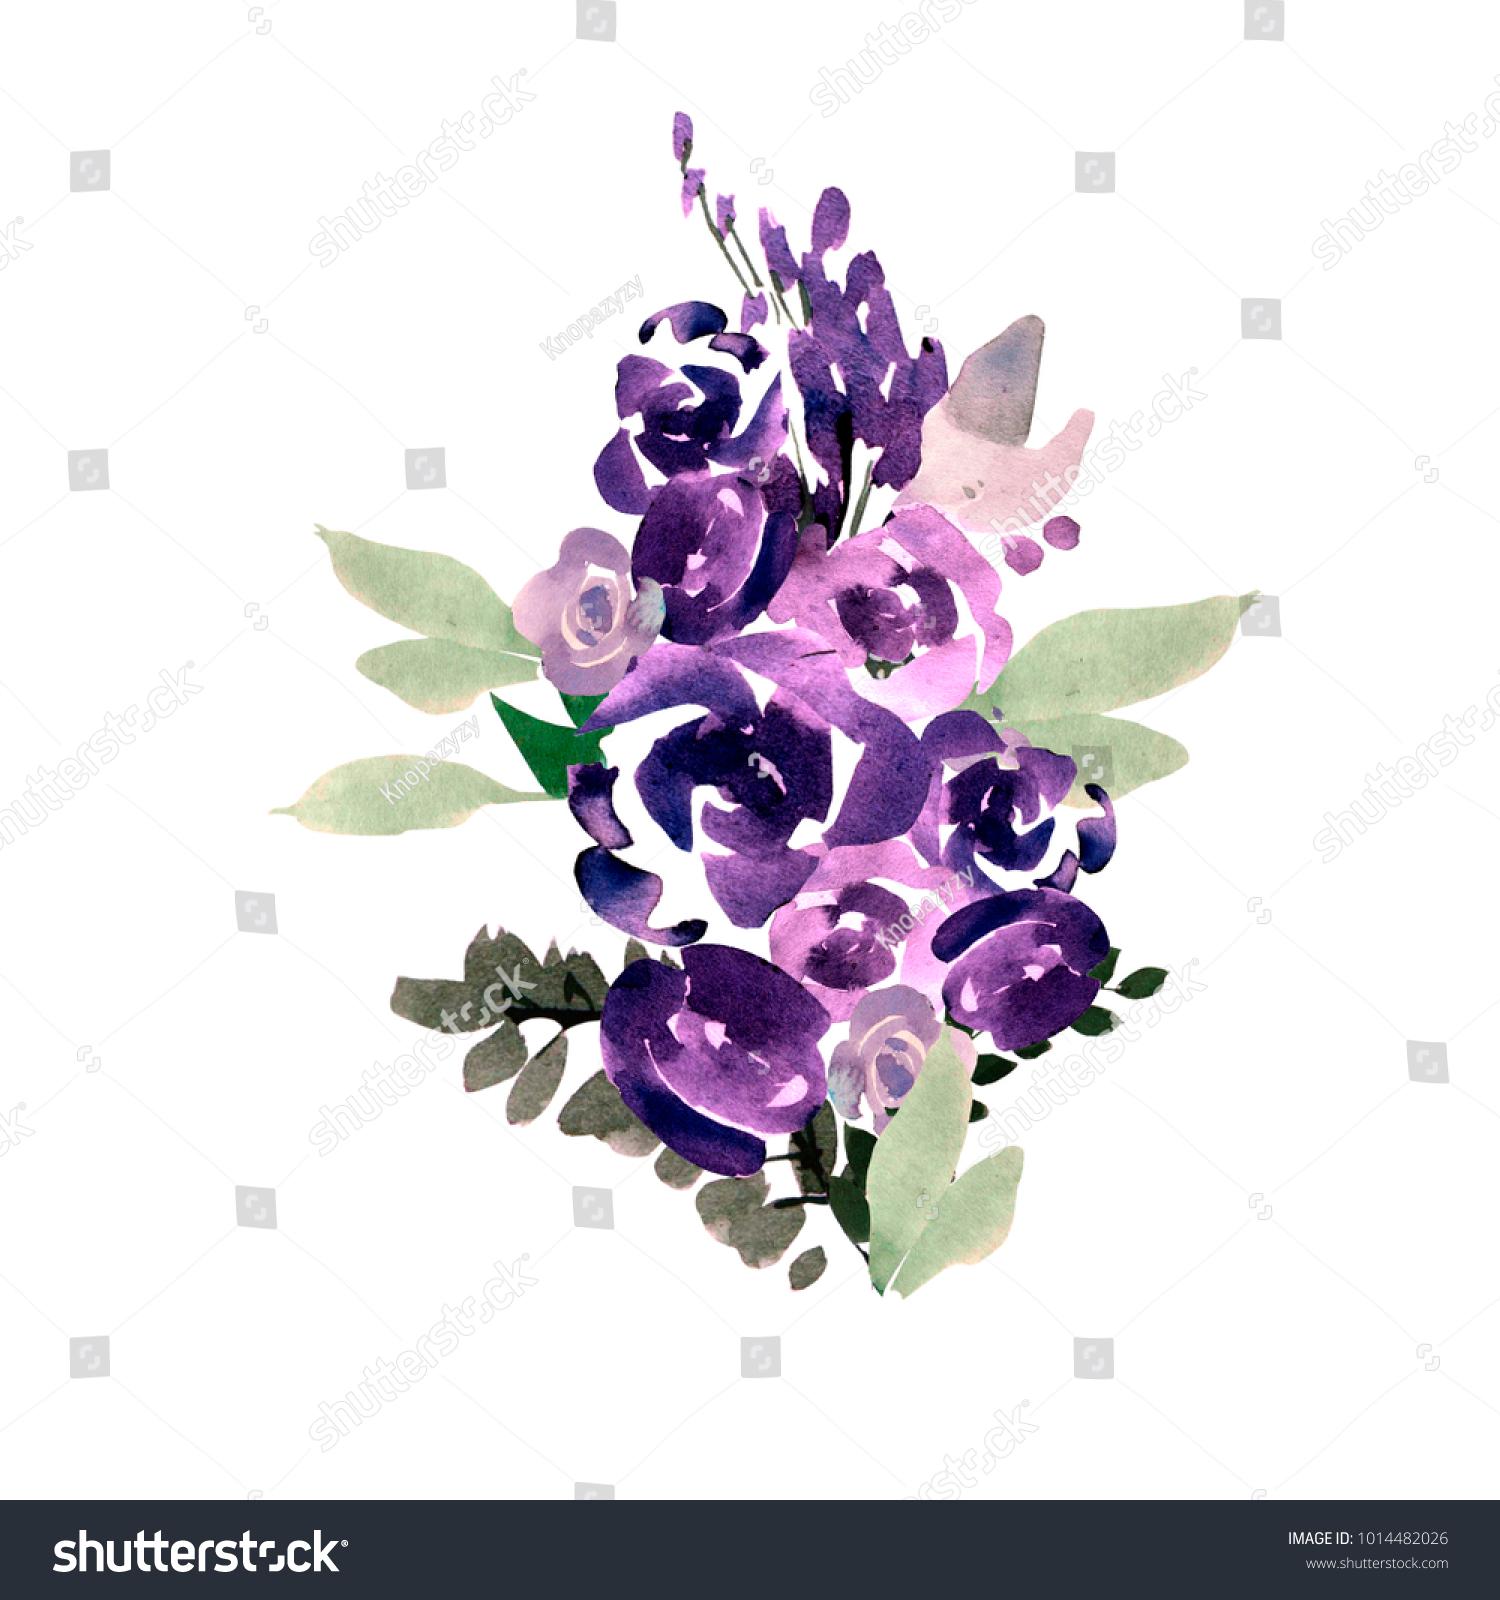 Beautiful Watercolor Wedding Bouquet With Purple Flowers